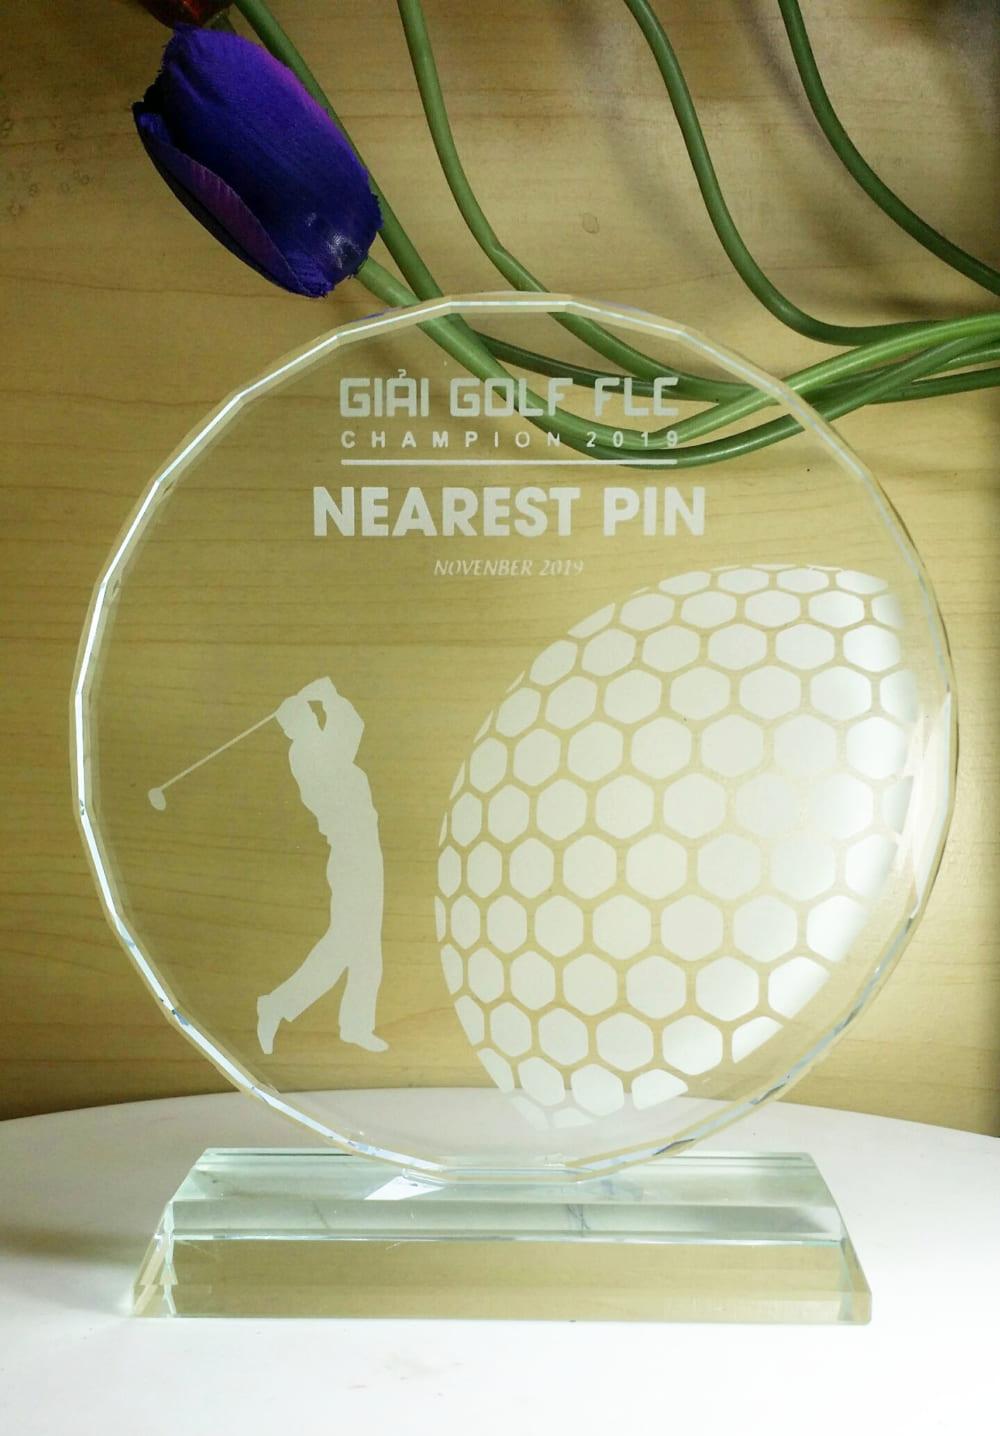 d4bea1e4d8ea3fb466fb 1000x1436 - Kỉ niệm chương mặt nguyệt golf pha lê